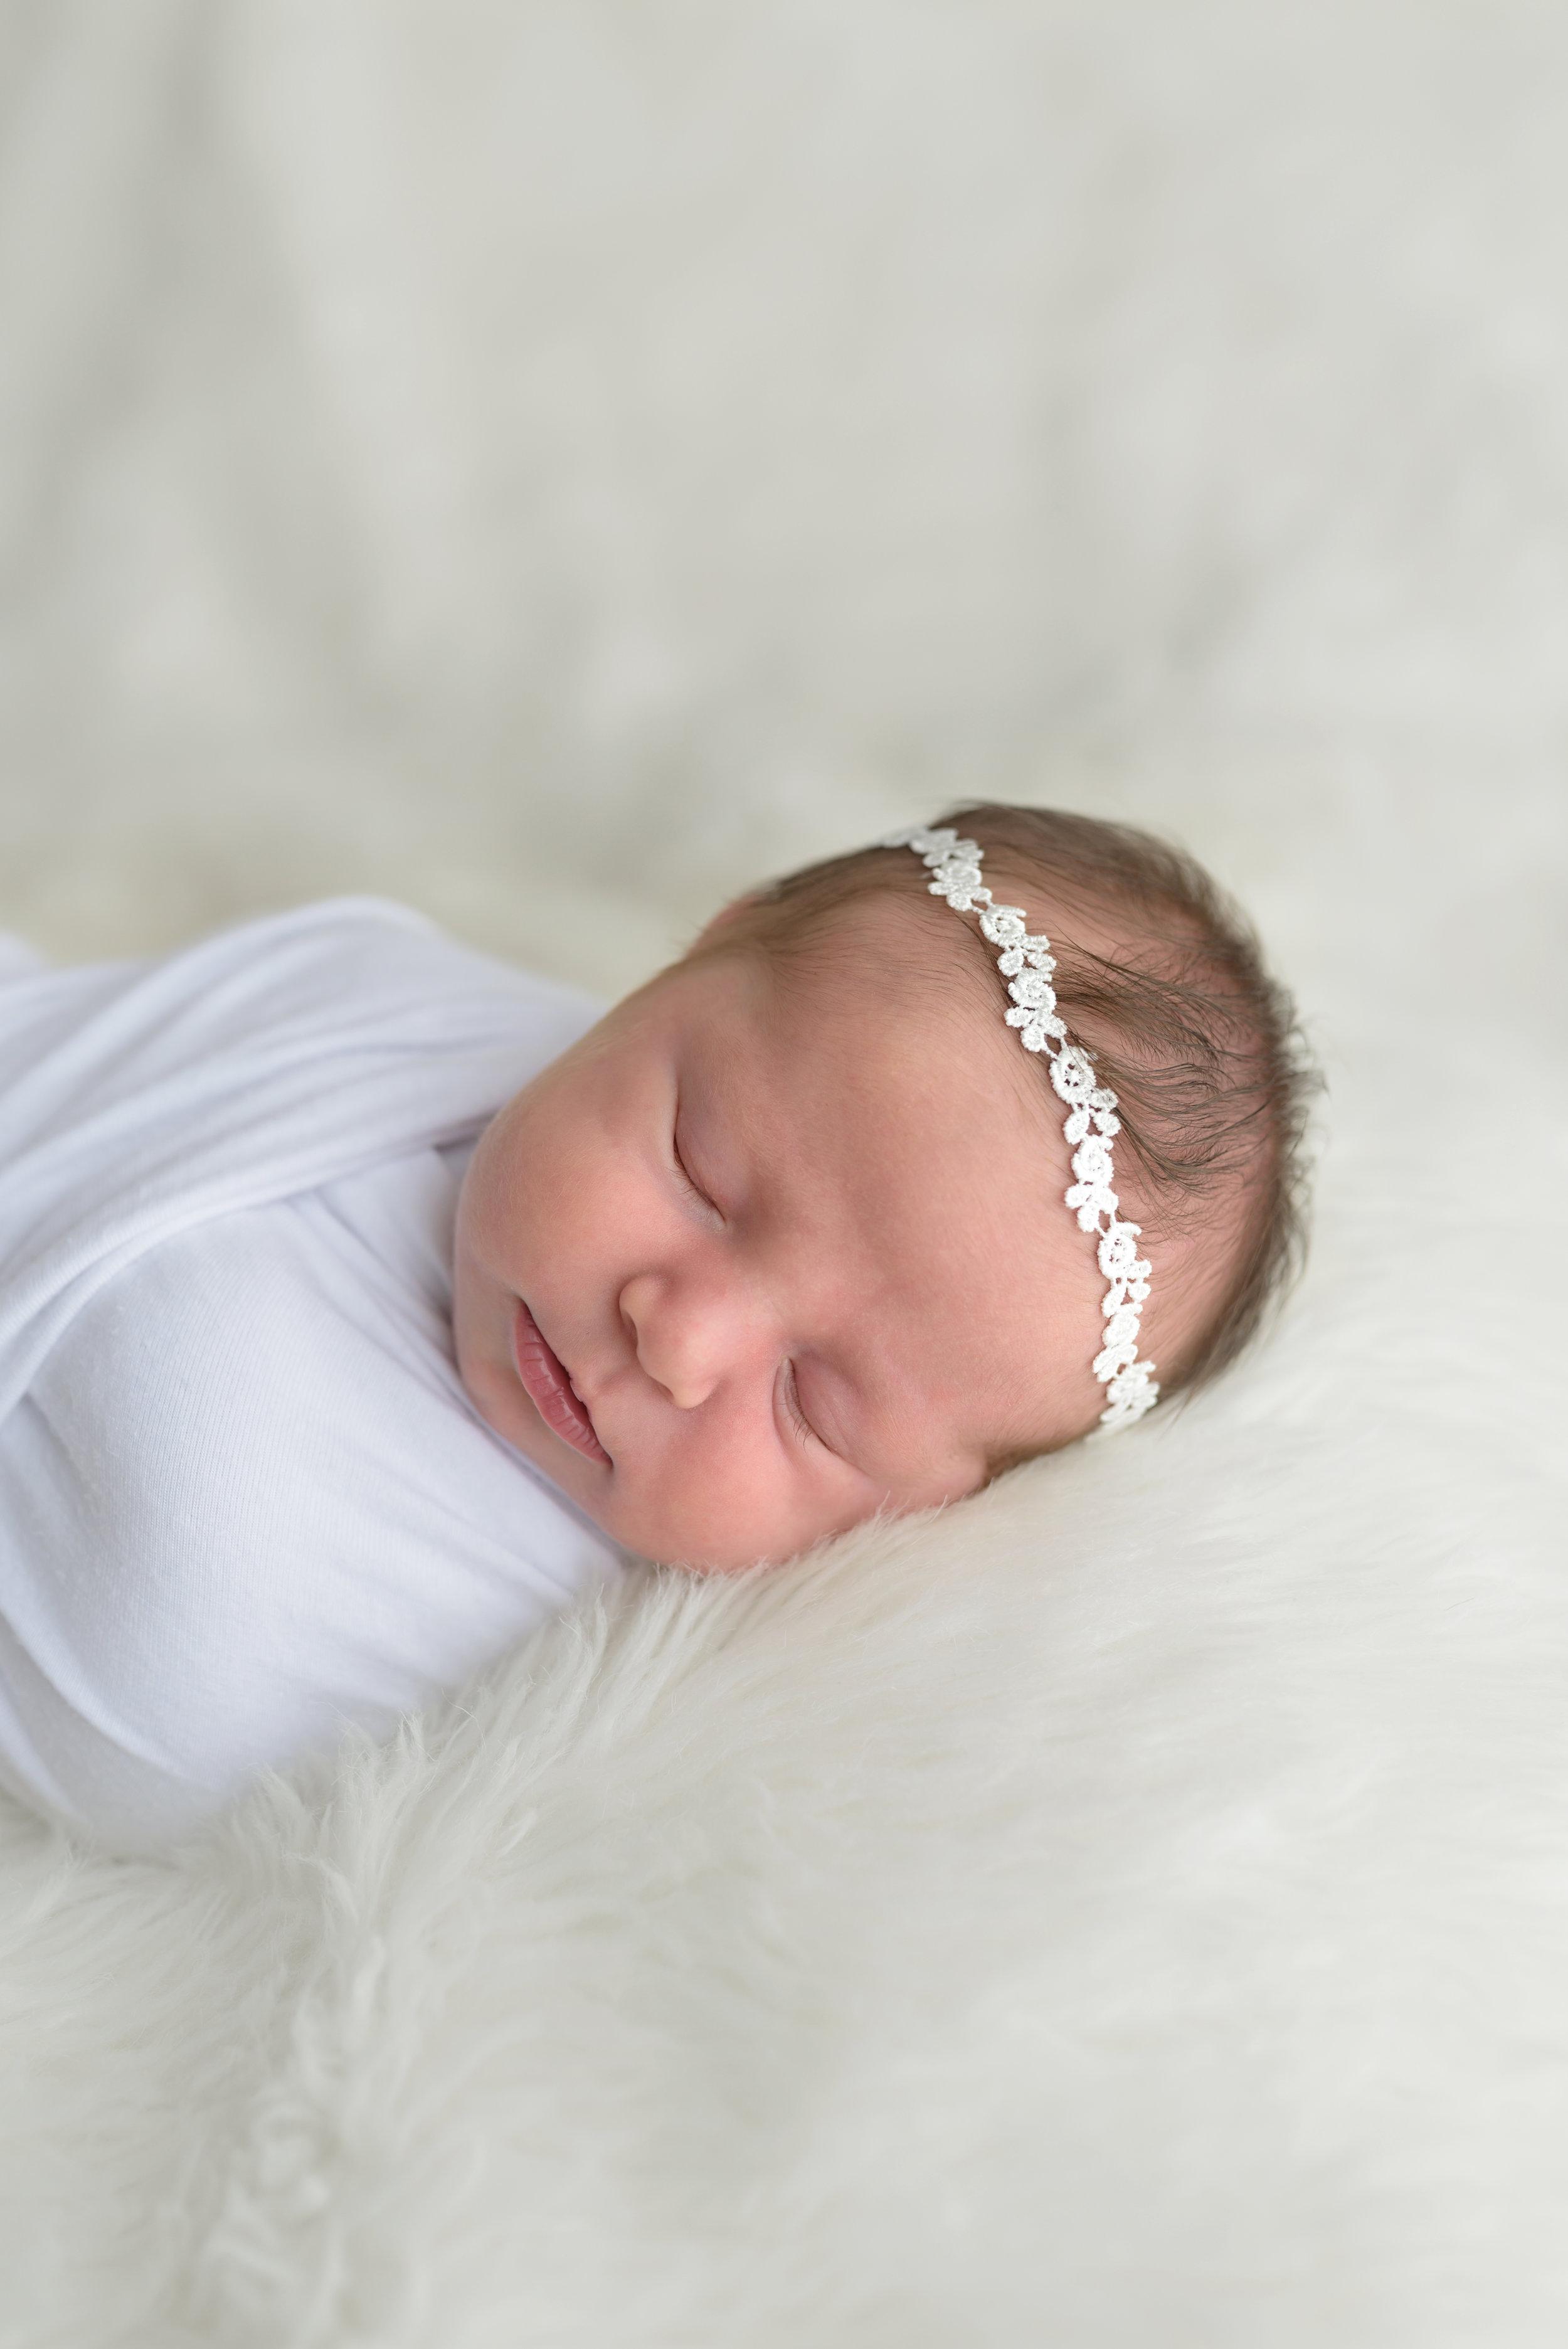 Charleston-Newborn-Photographer-Following-Seas-Photography-fsp_5178 copy.jpg